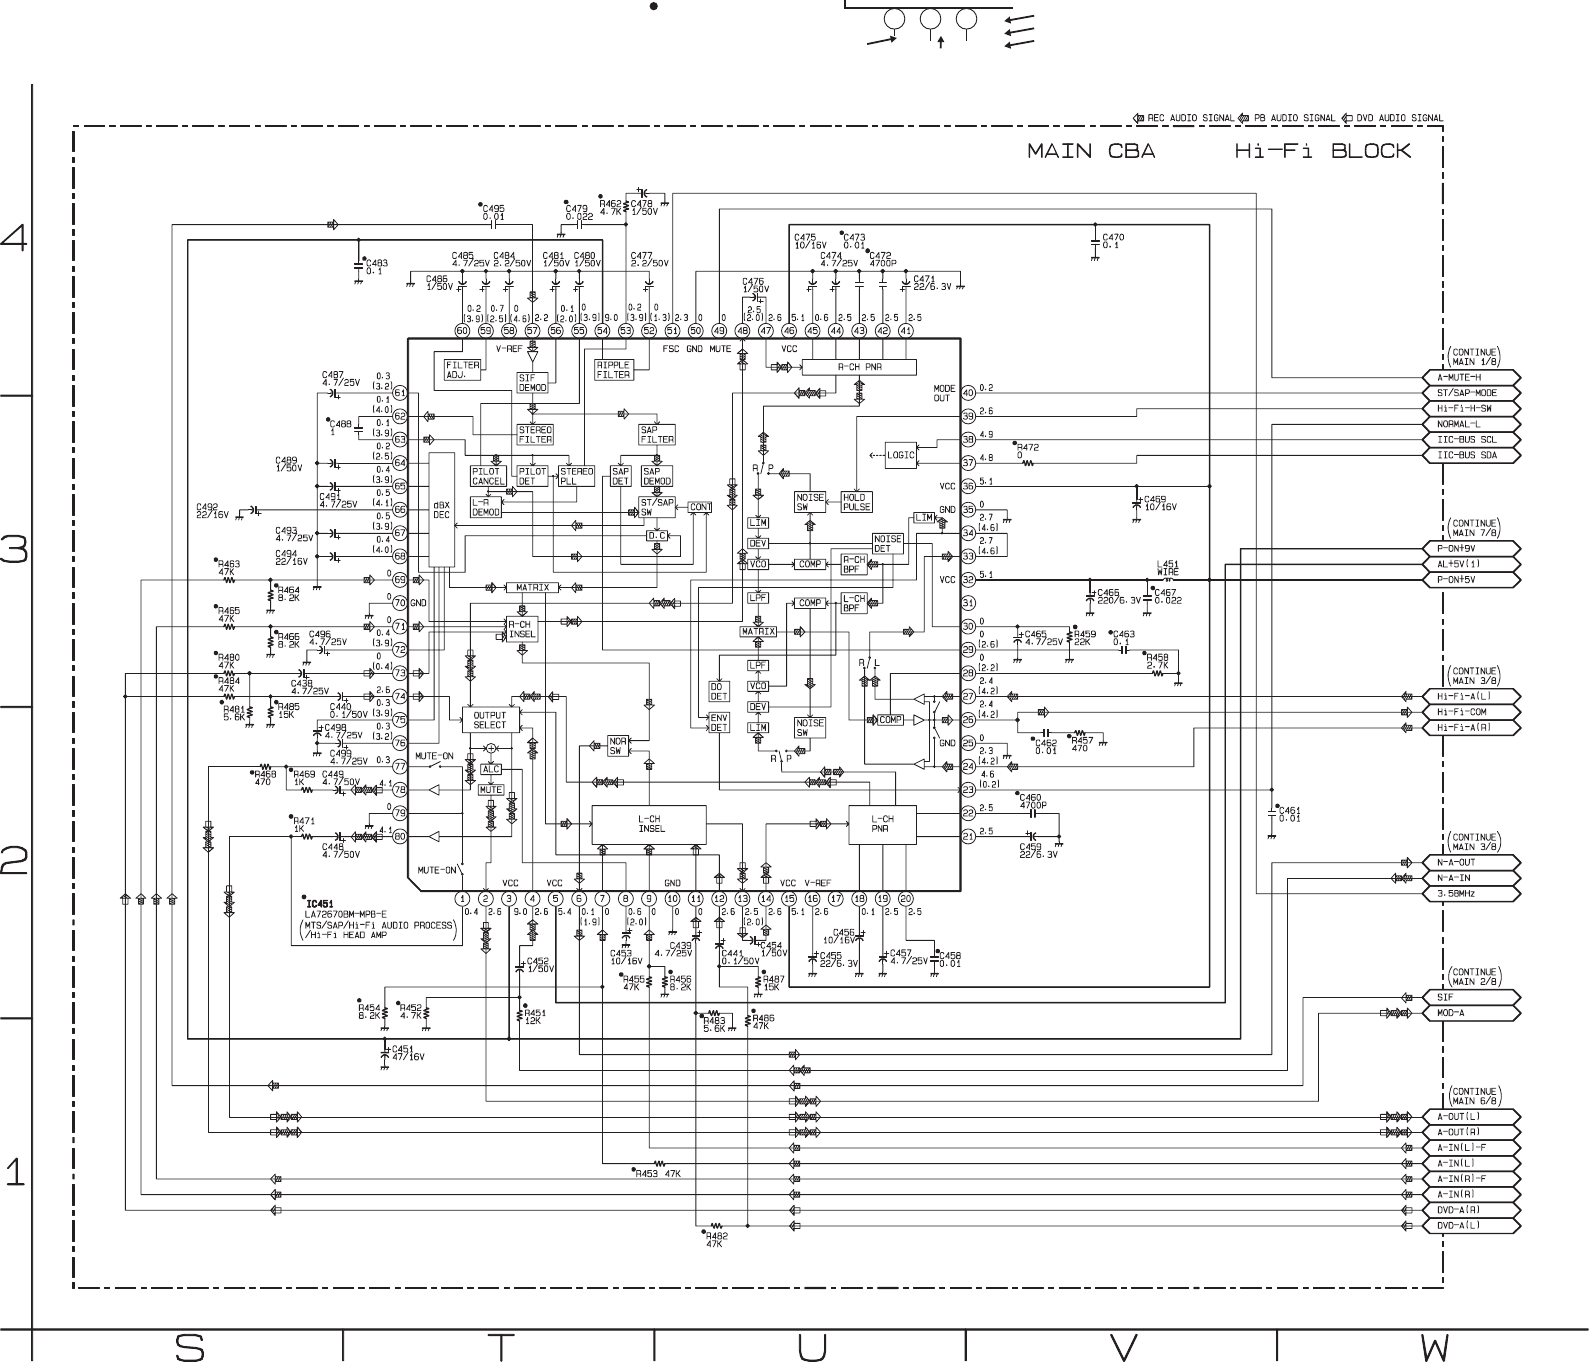 H9622md Dvp620 Drive Scr Flash Circuit Diagram Powersupplycircuit Main 4 8 Schematic Vcr Section